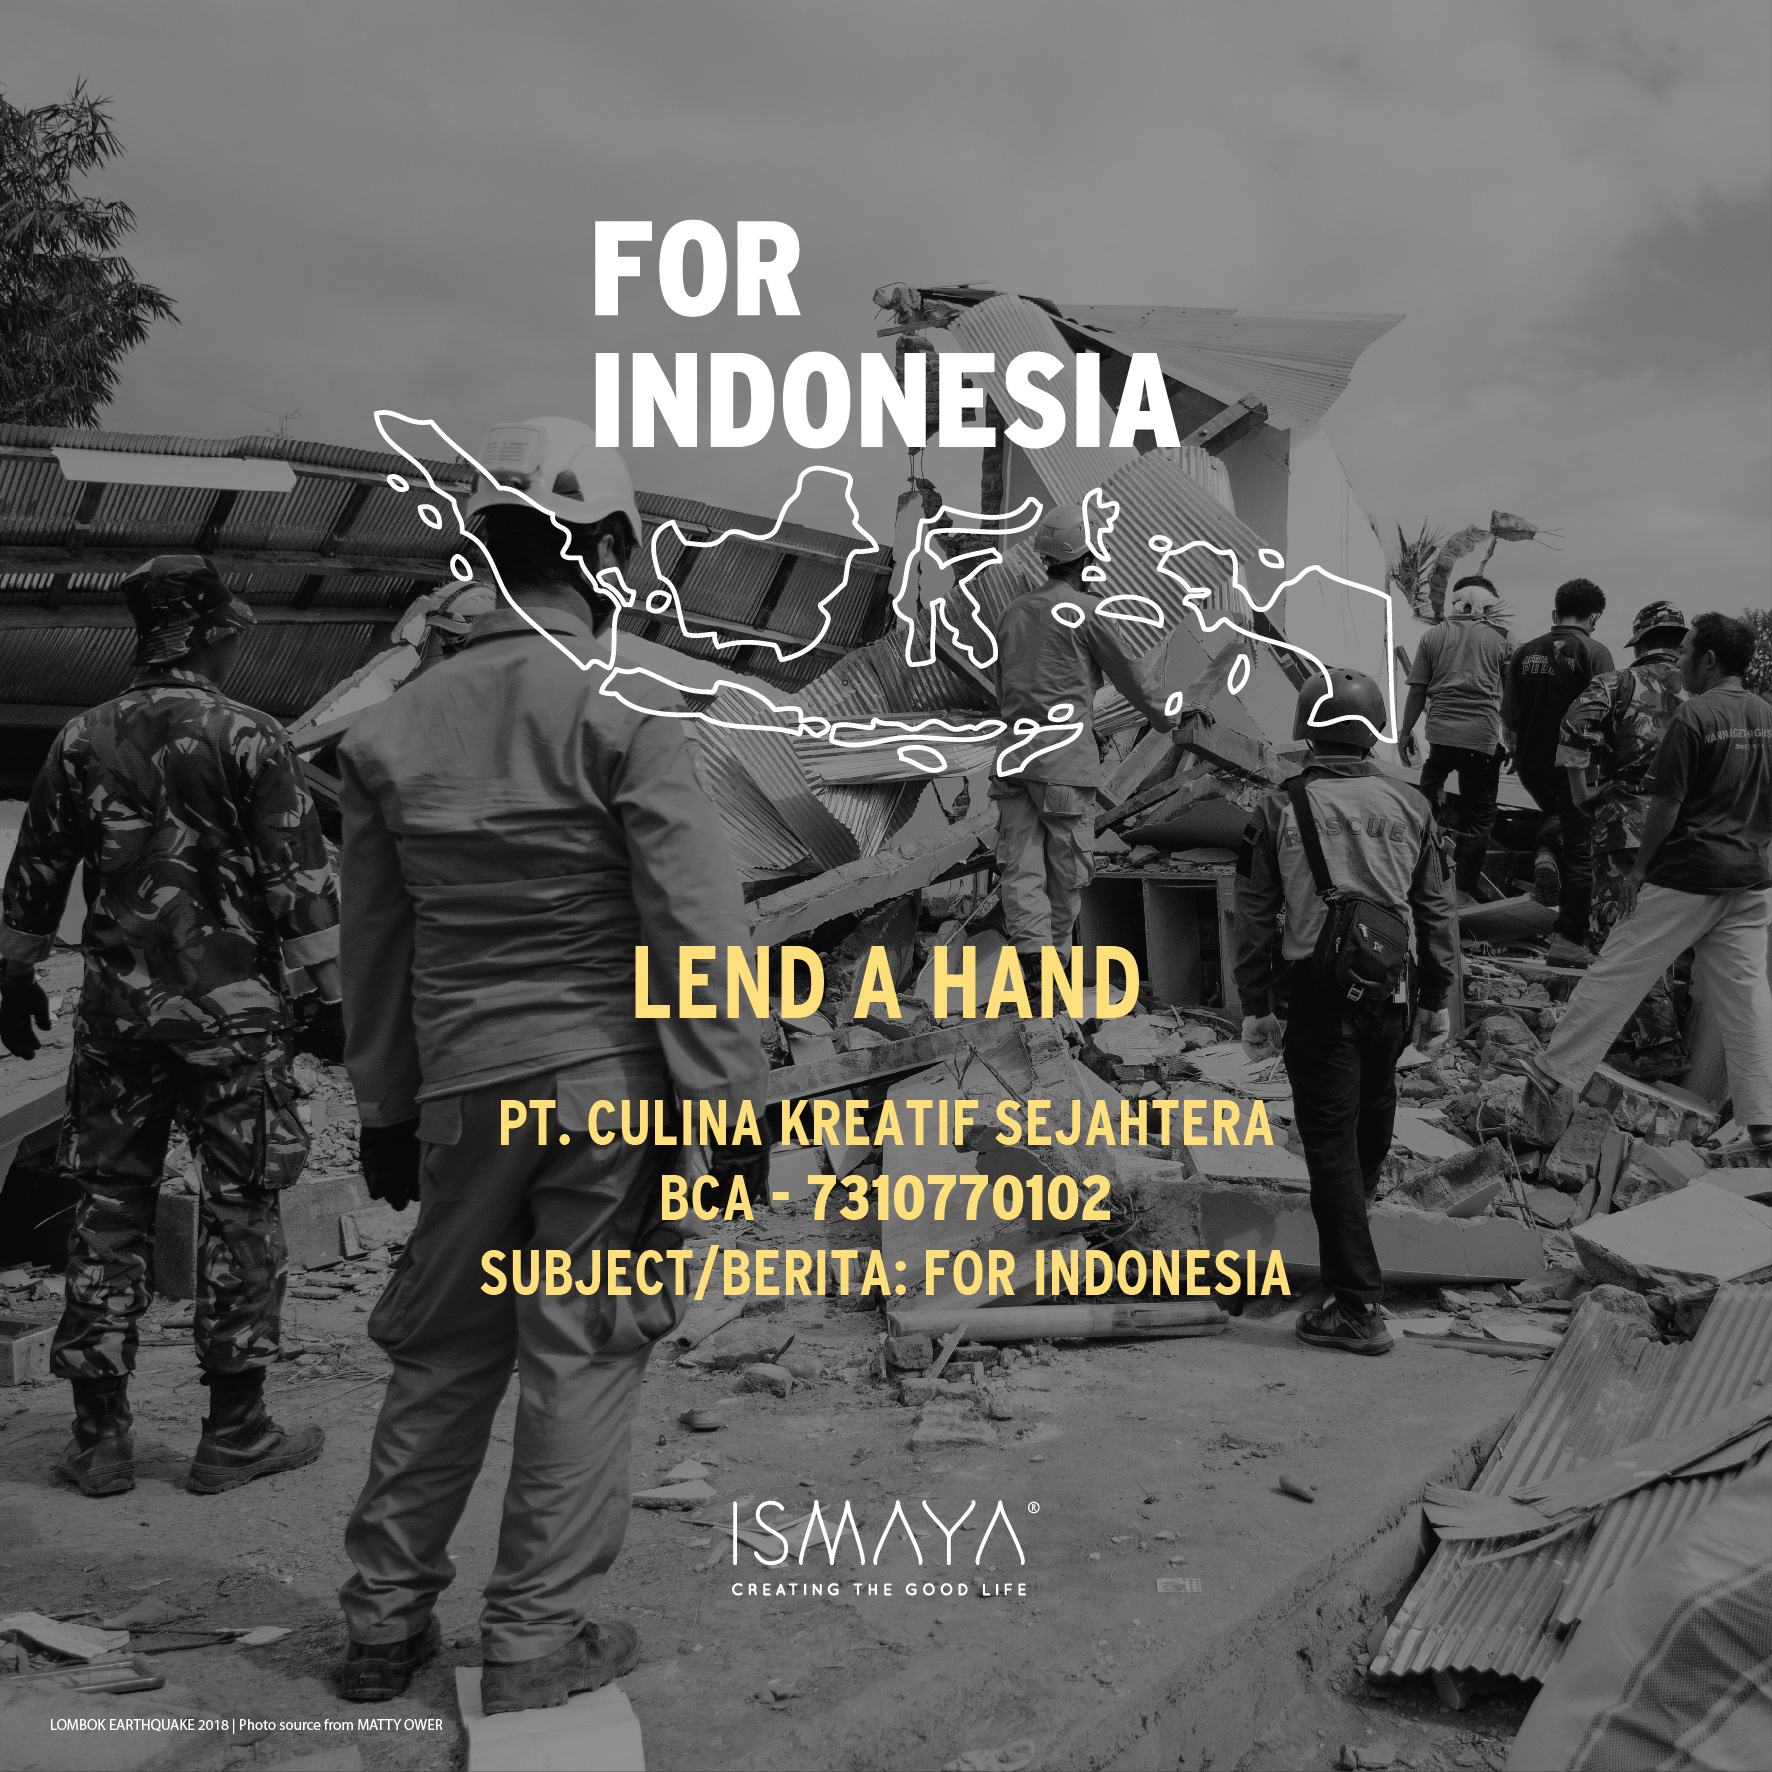 For Indonesia-01.jpg